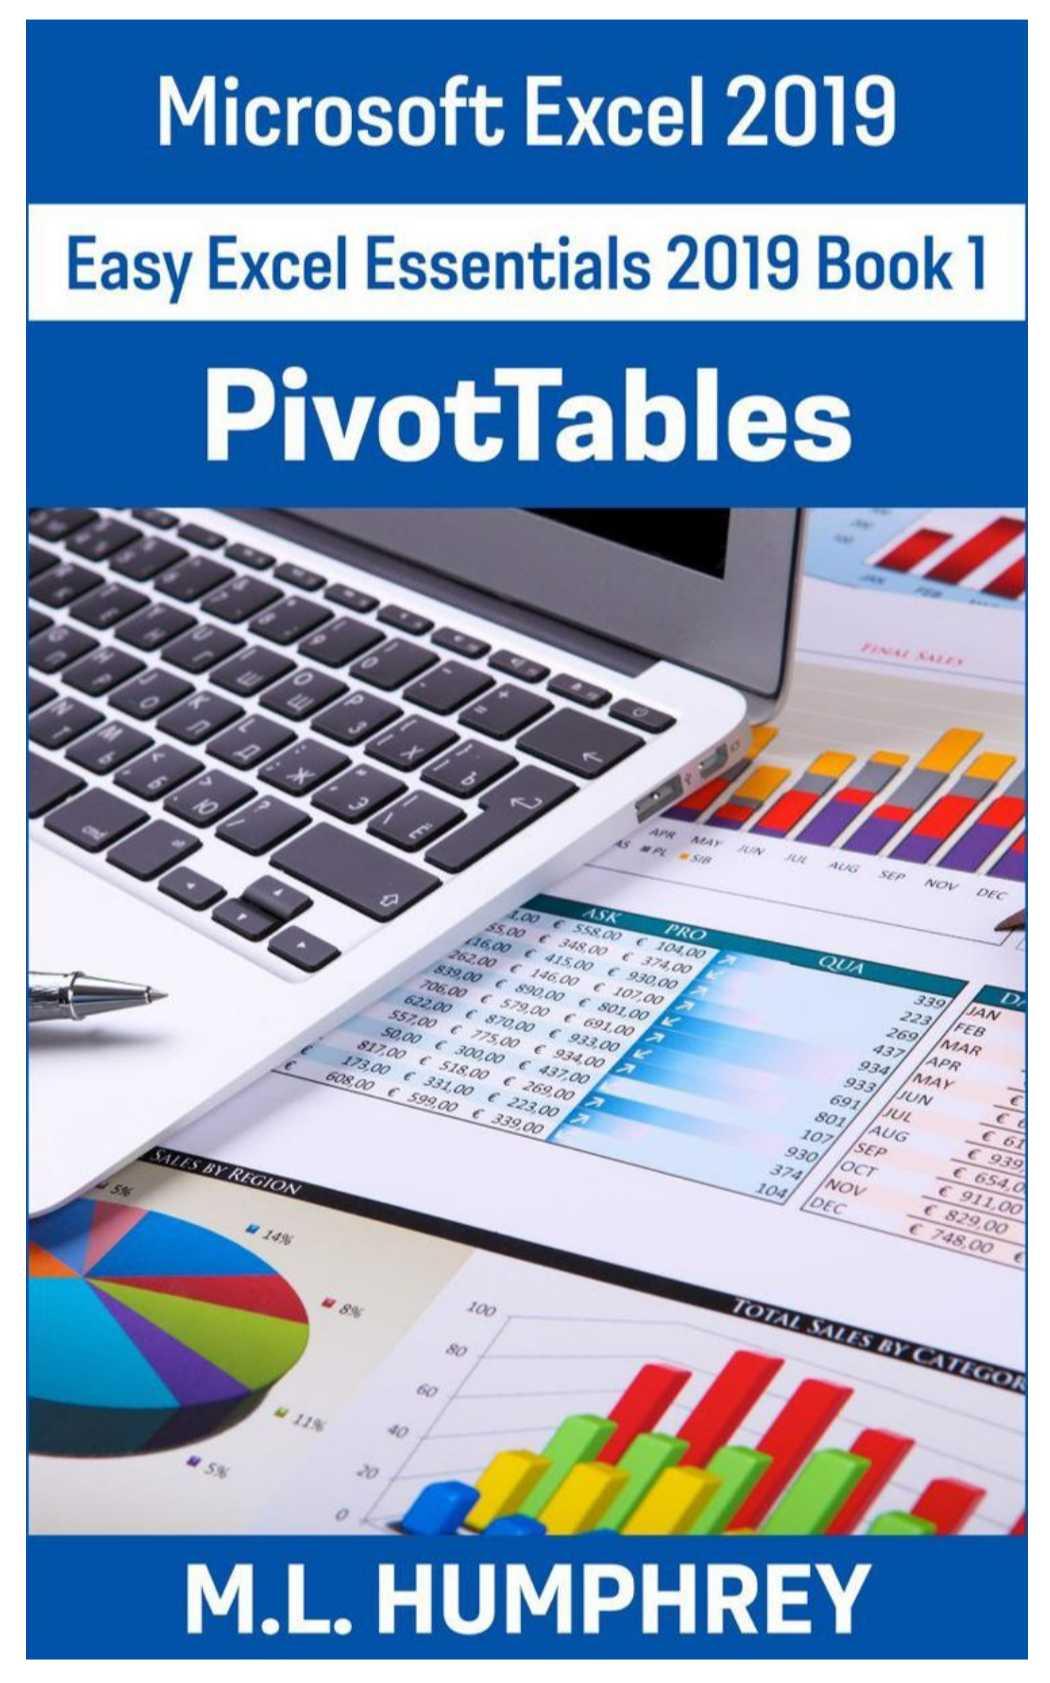 Excel 2019 PivotTables: Easy Excel Essentials 2019 Book 1